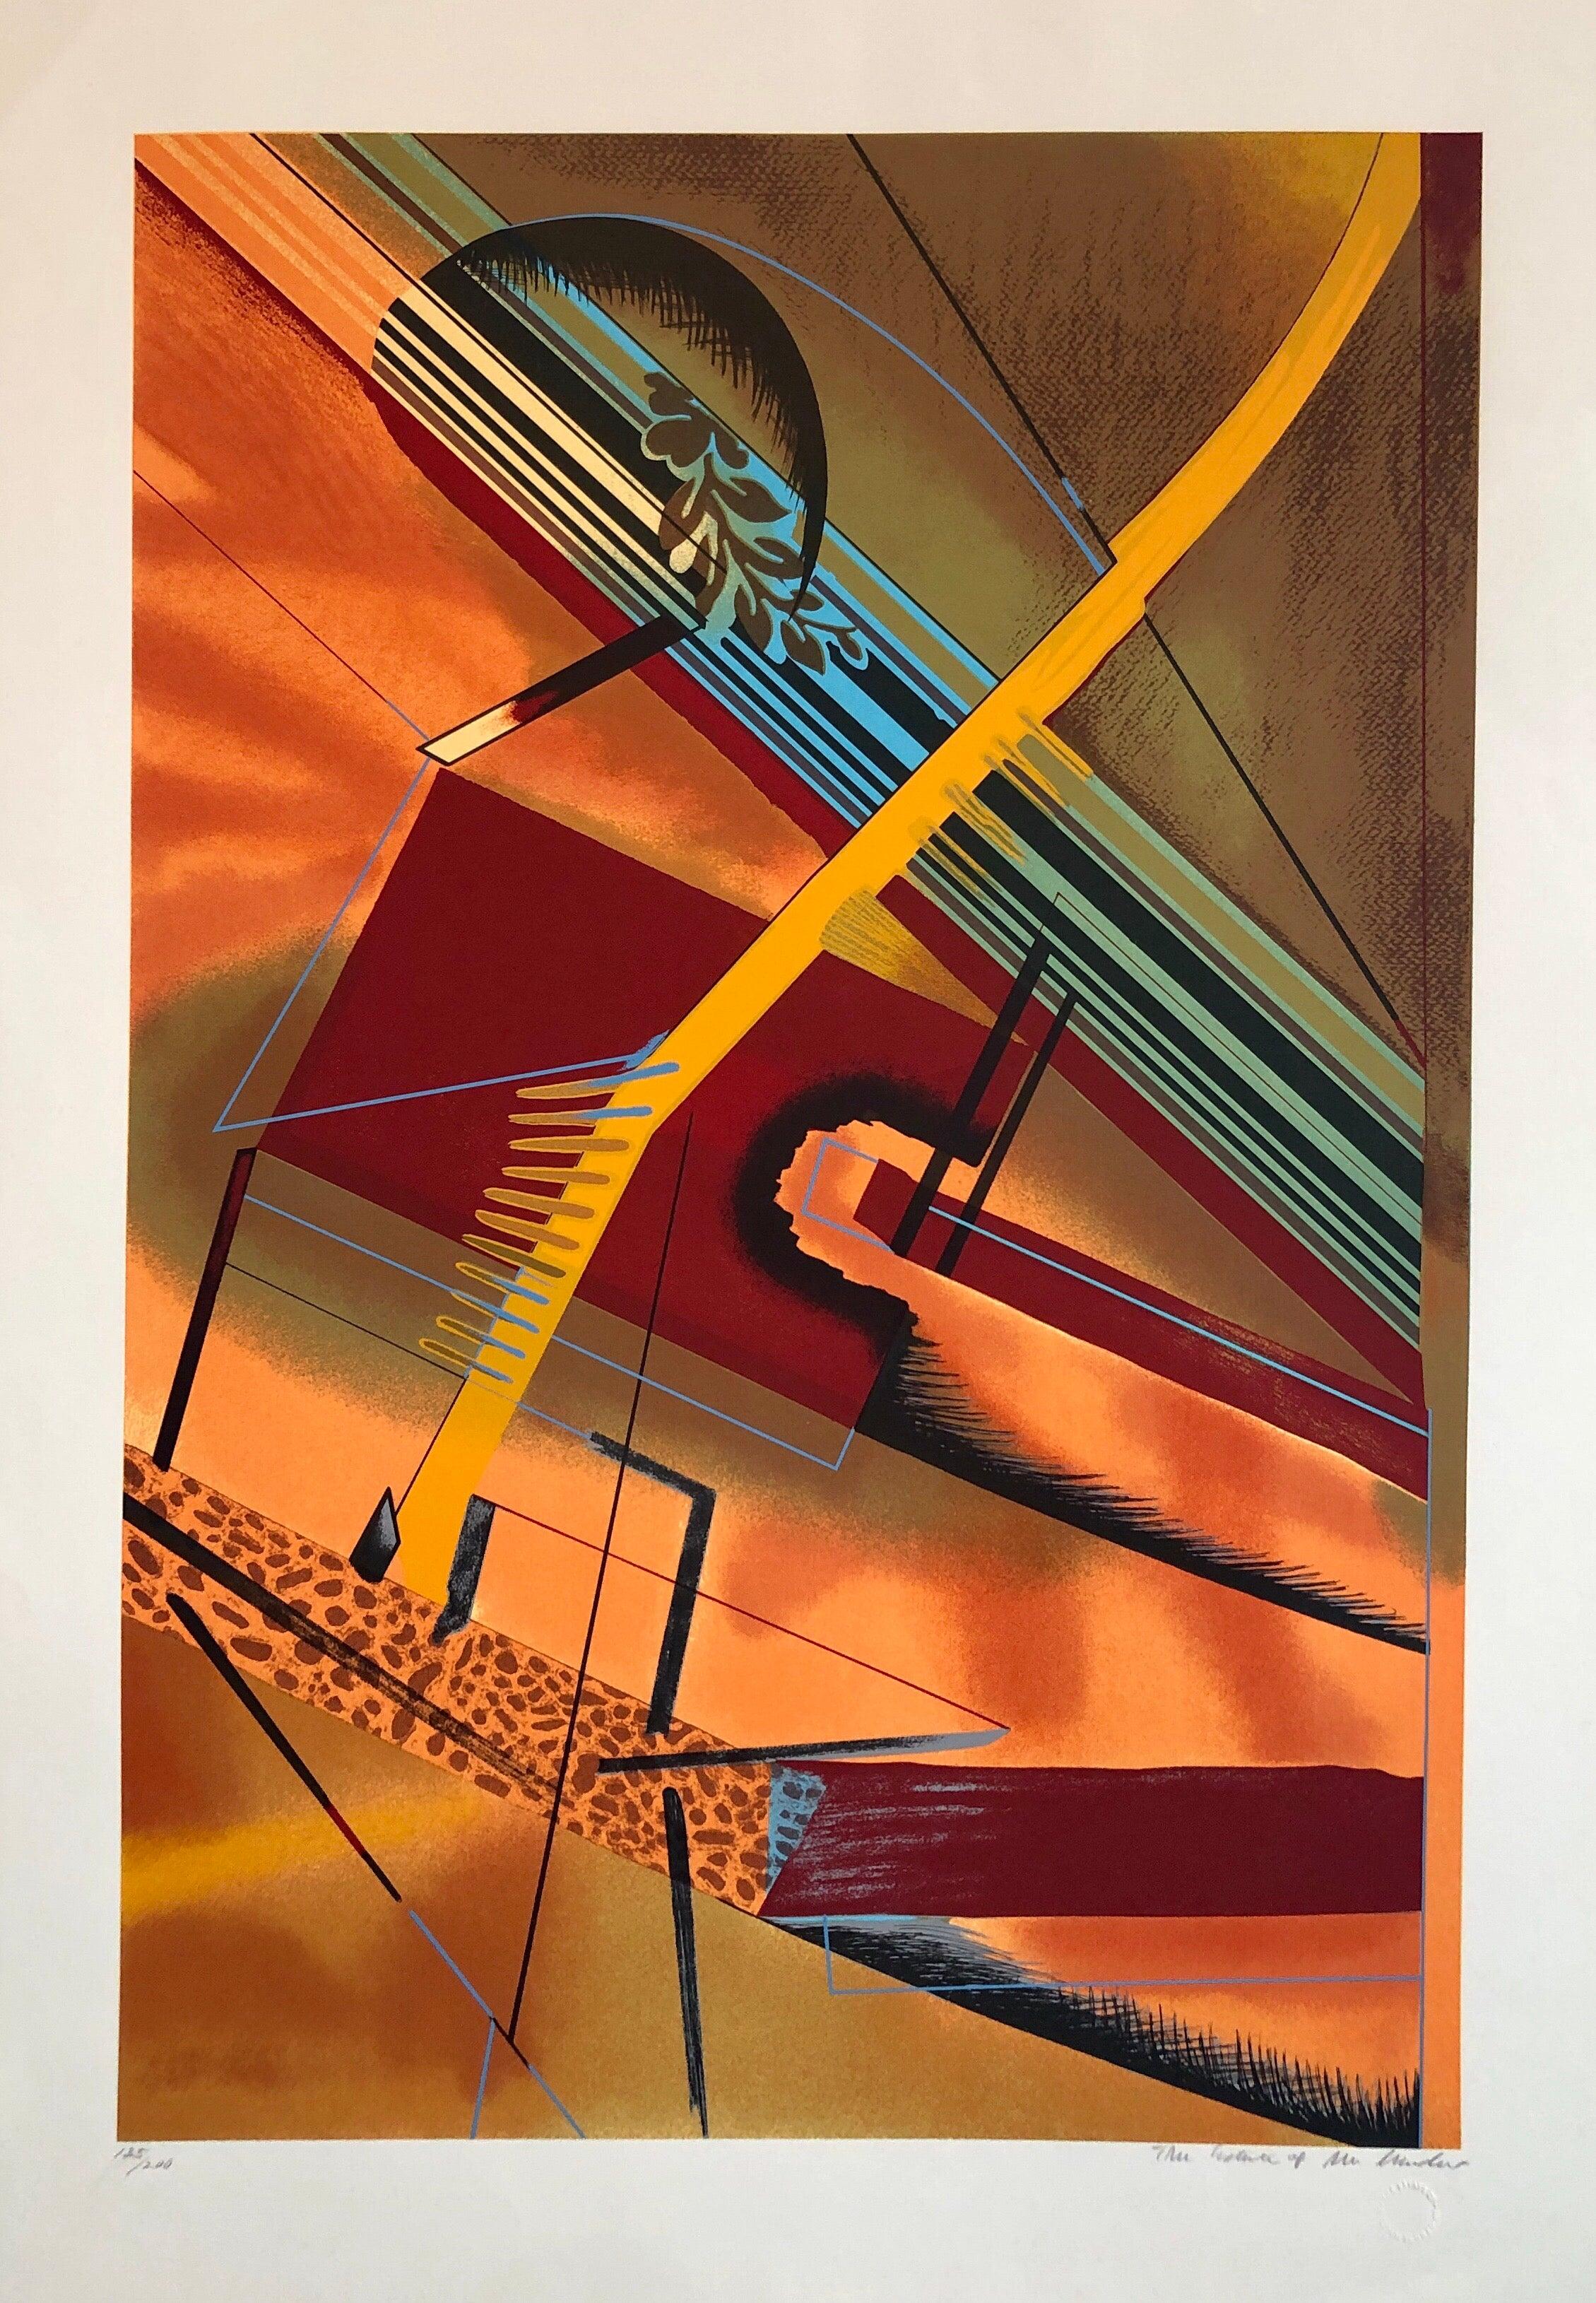 Surrealist Architectural Landscape Silkscreen 1970s Chicago Modernist Lithograph